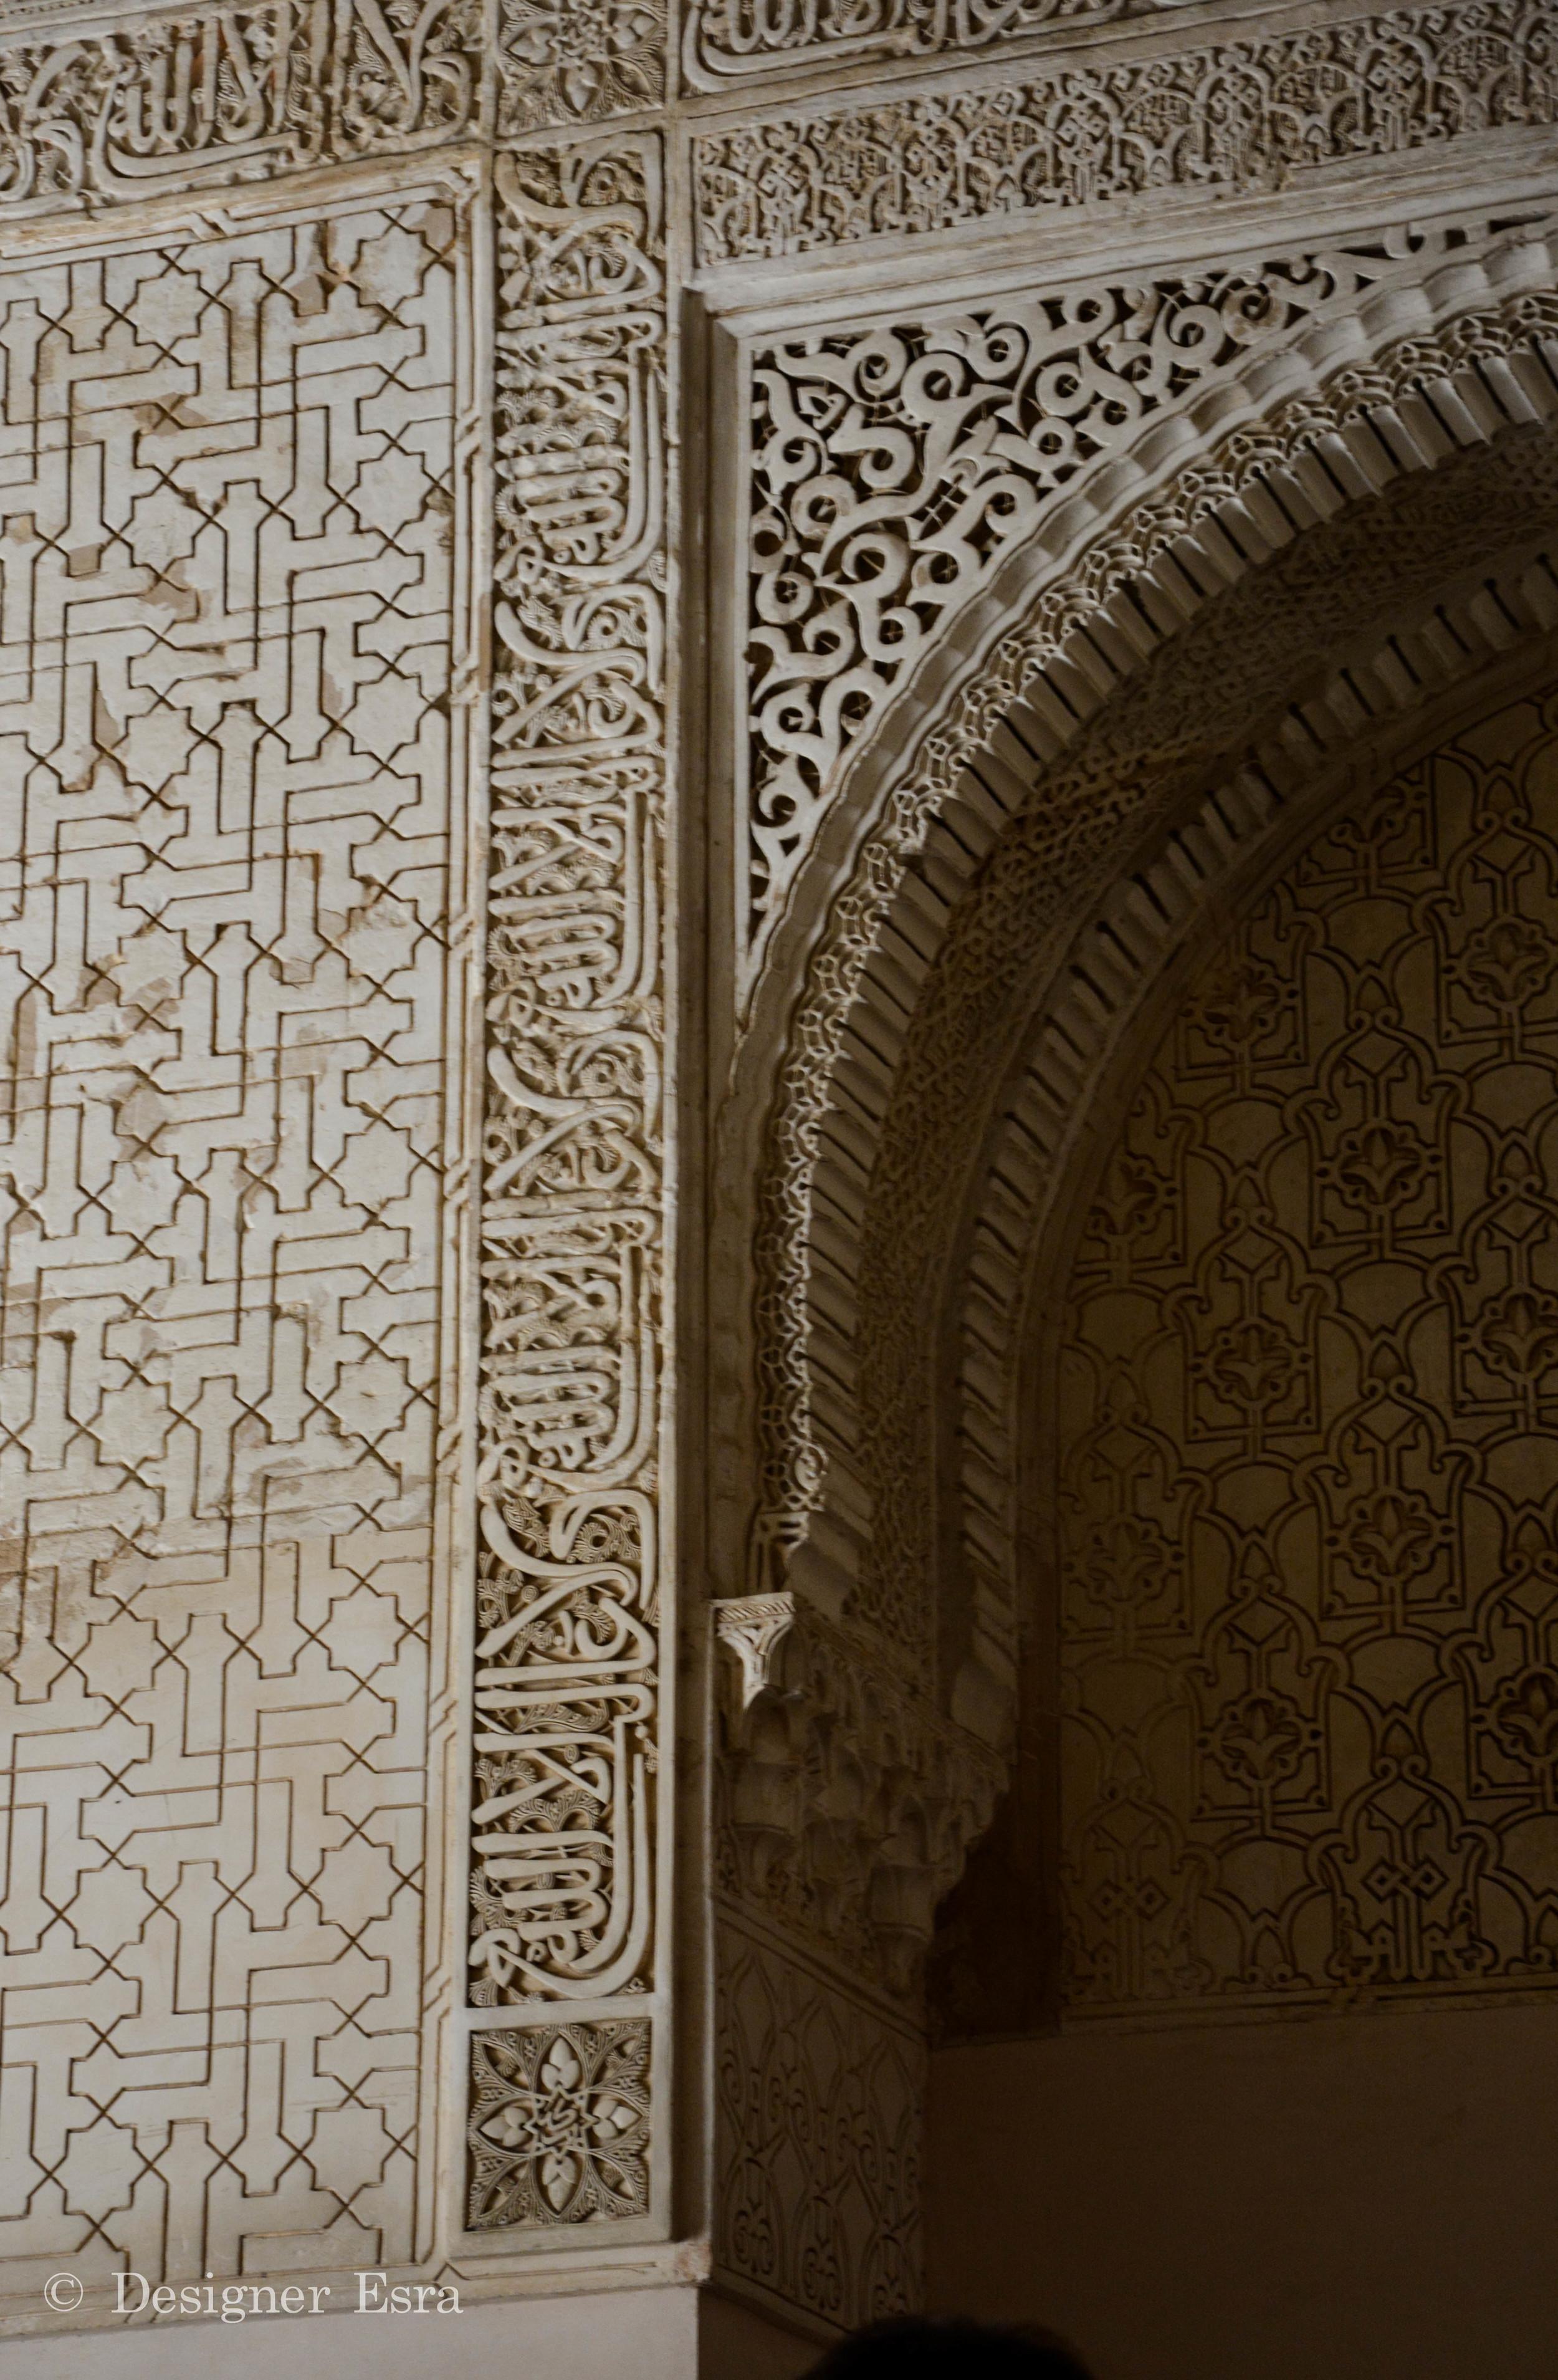 Islamic Geometric Patterns in Spain